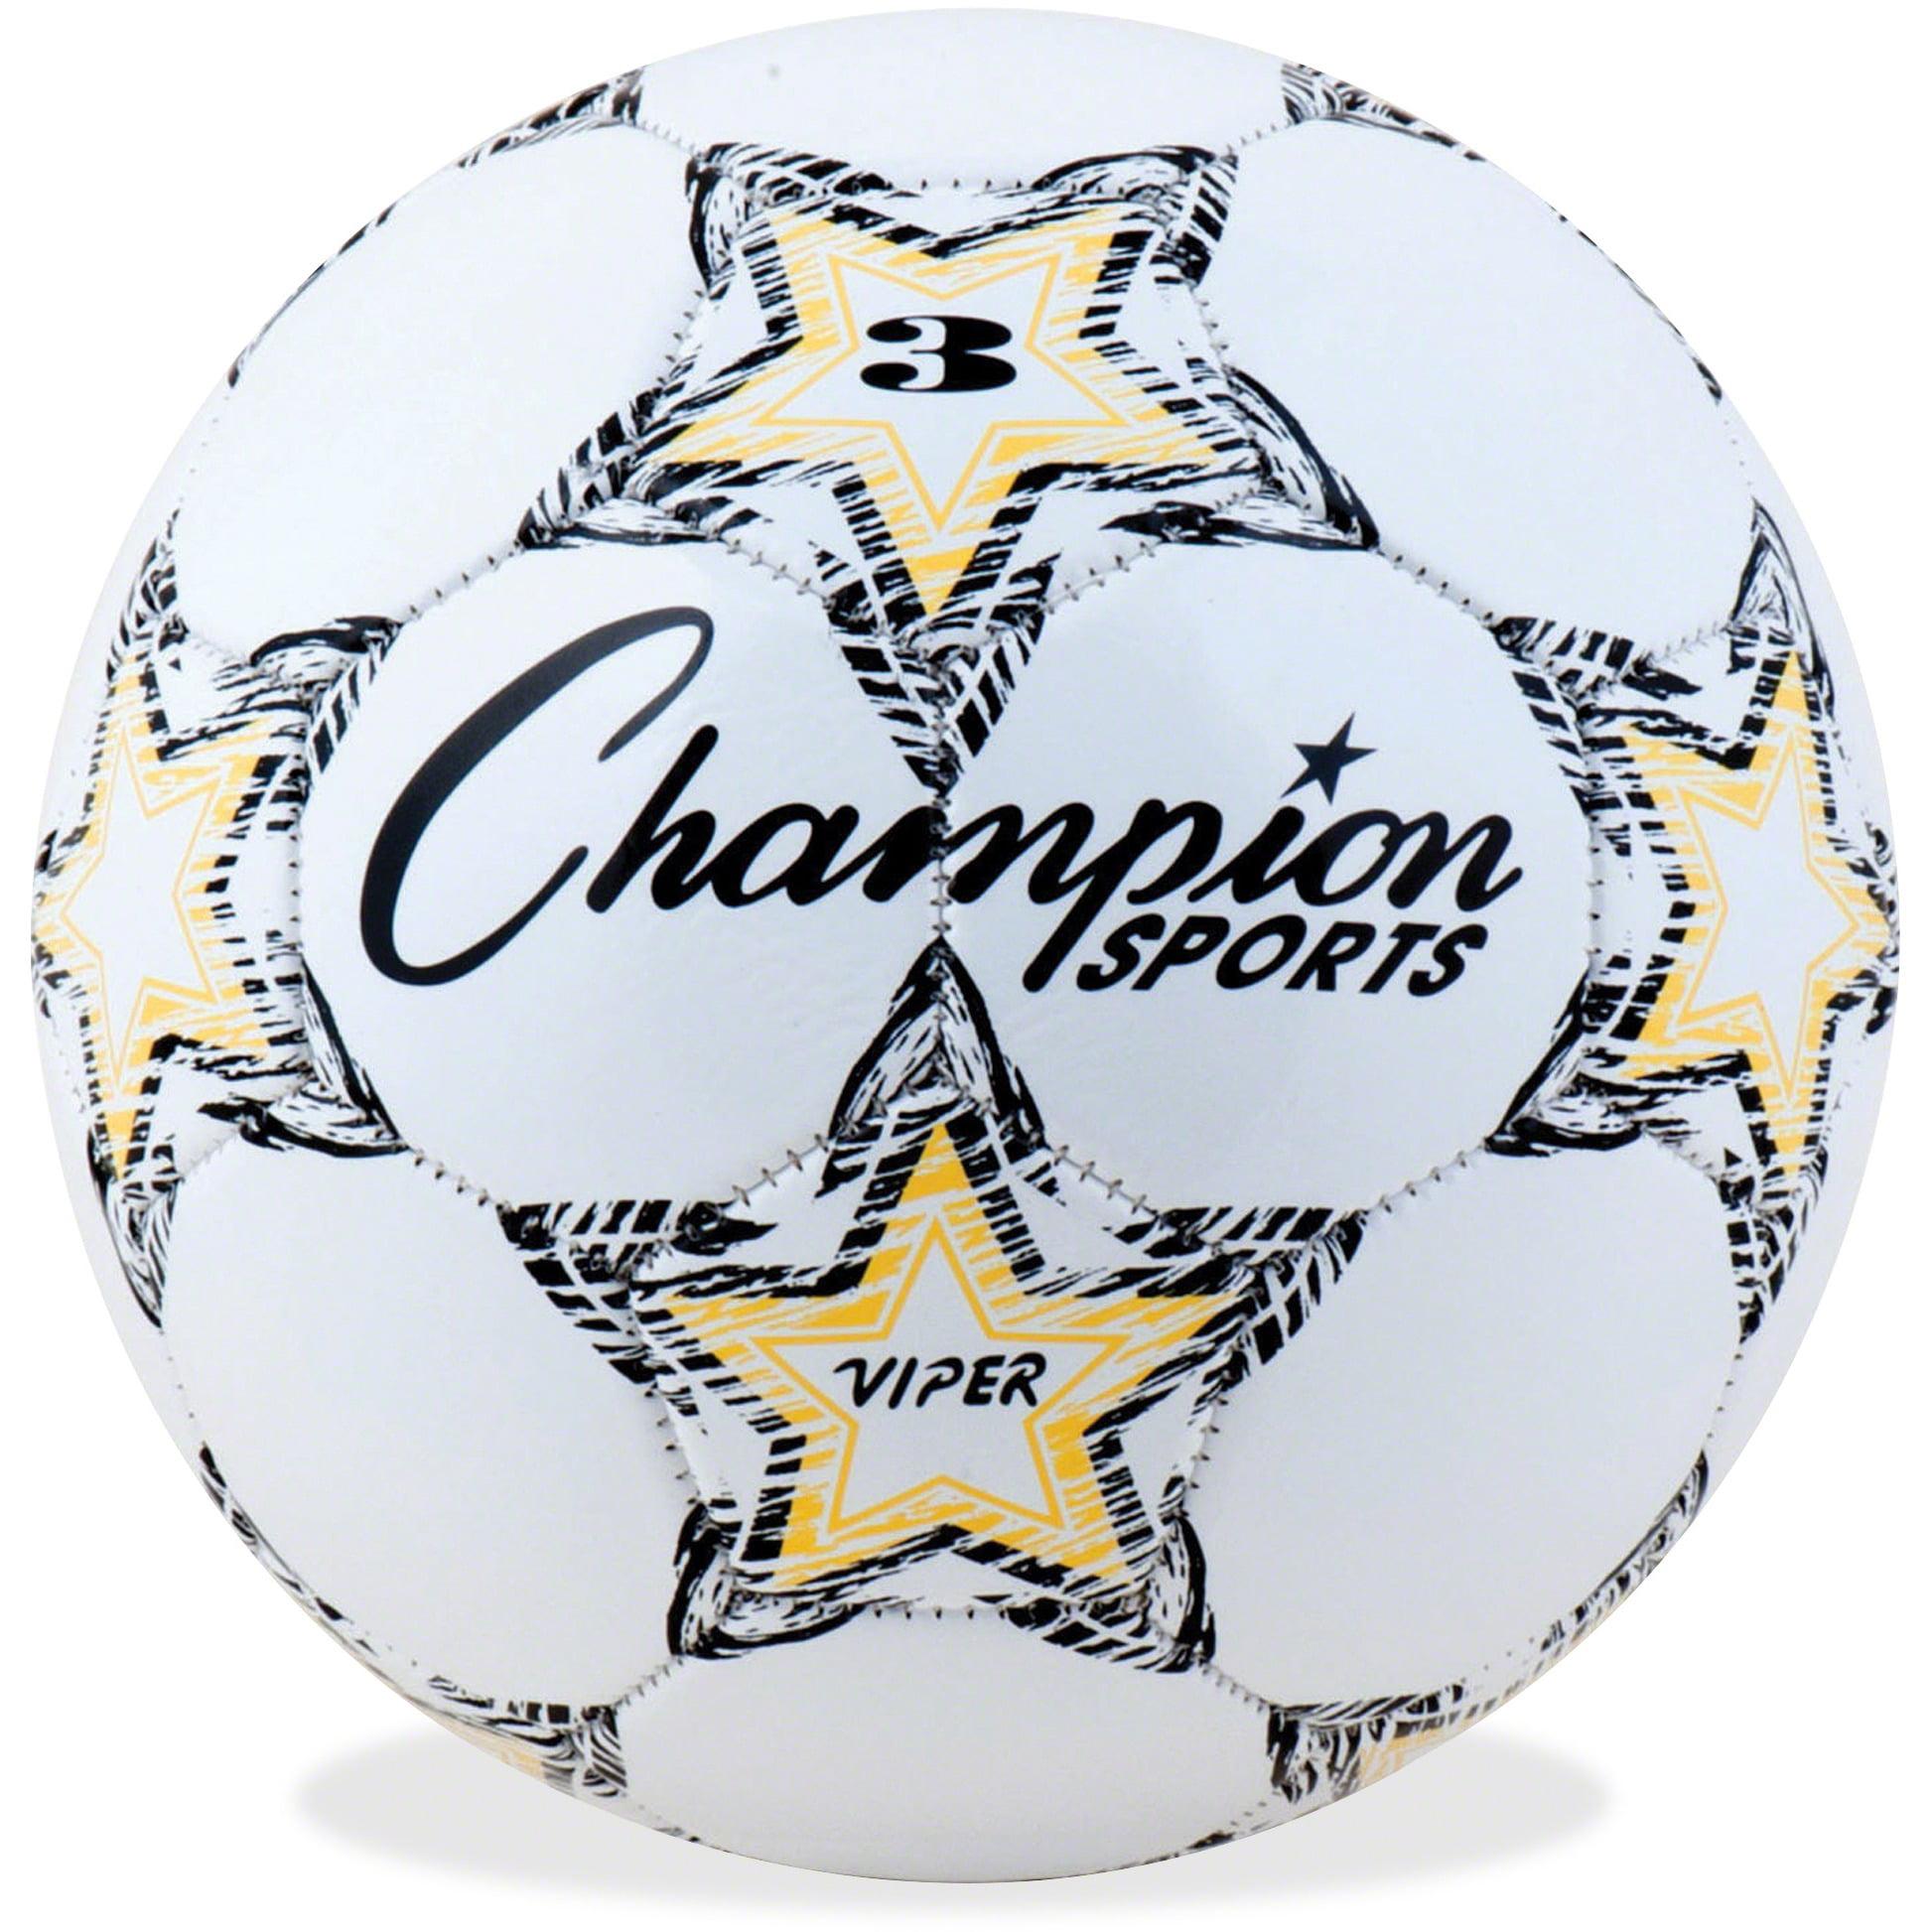 Champion Sport s Size 3 Viper Soccer Ball, White, Yellow, Black, 1 Each (Quantity)